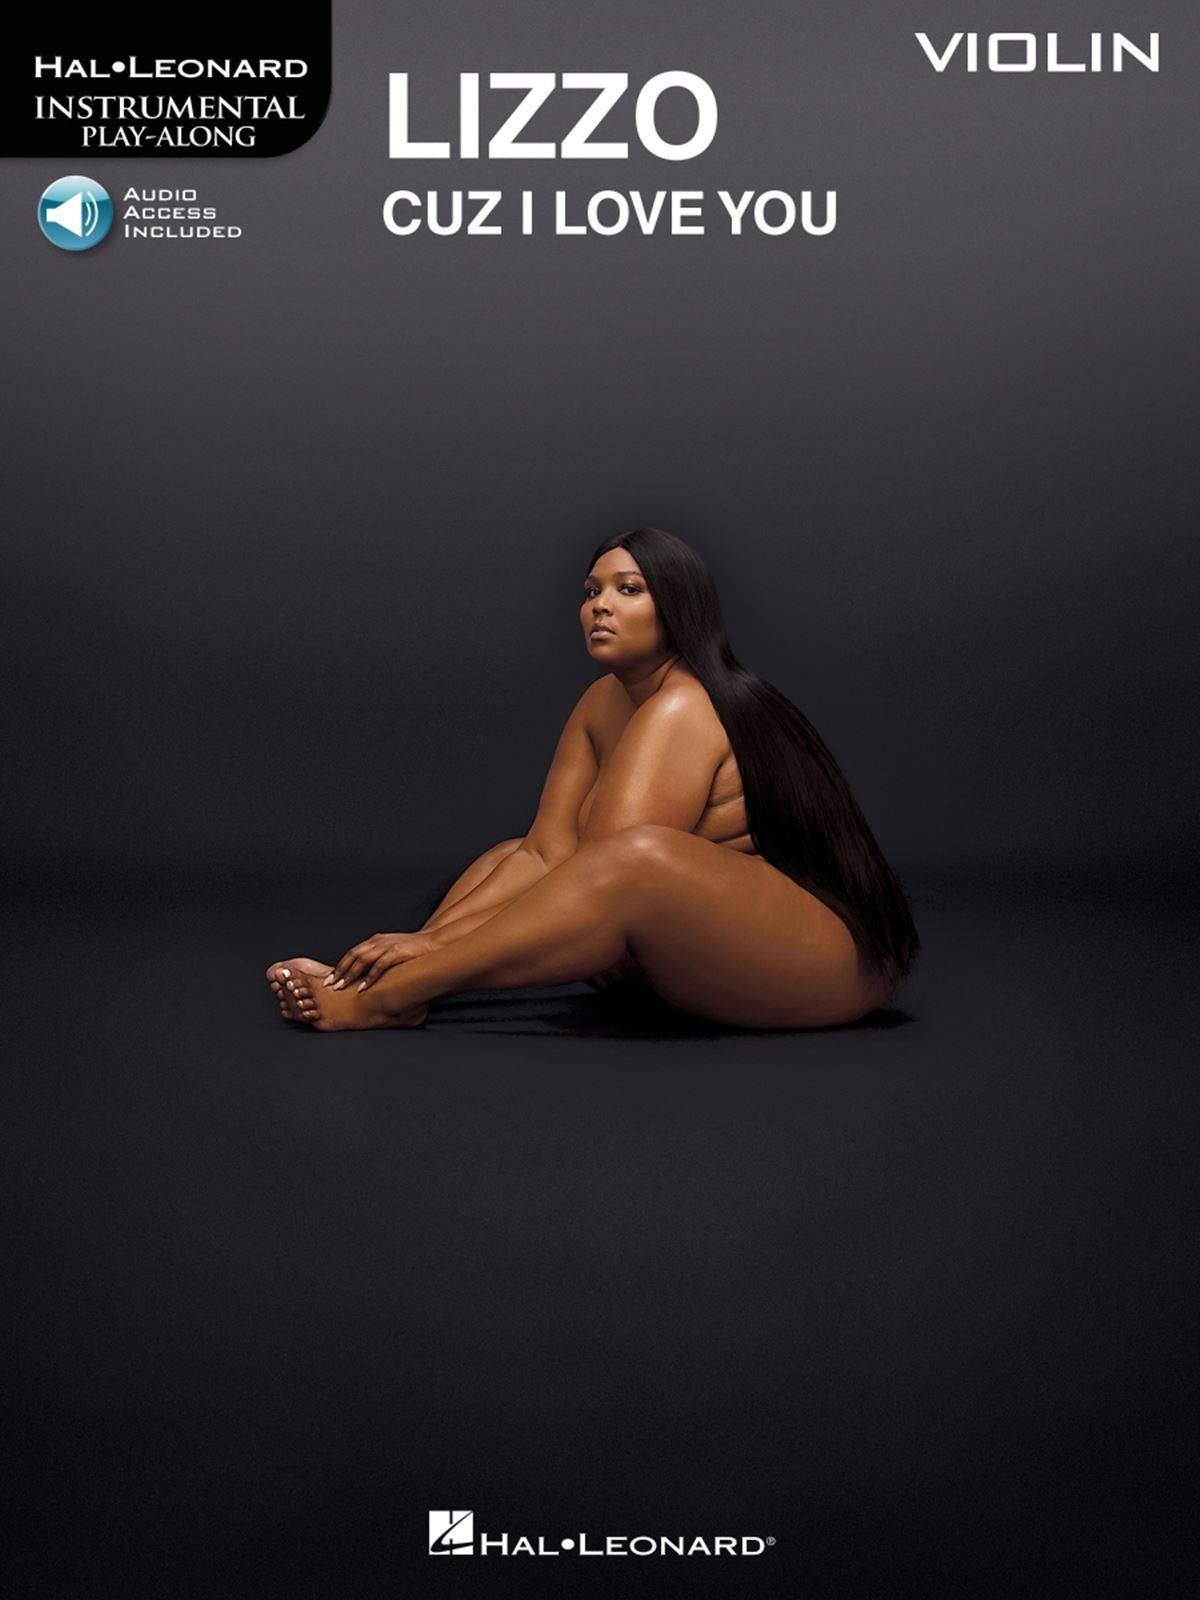 Lizzo: Lizzo - Cuz I Love You Instrumental Play-Along: Violin Solo: Album